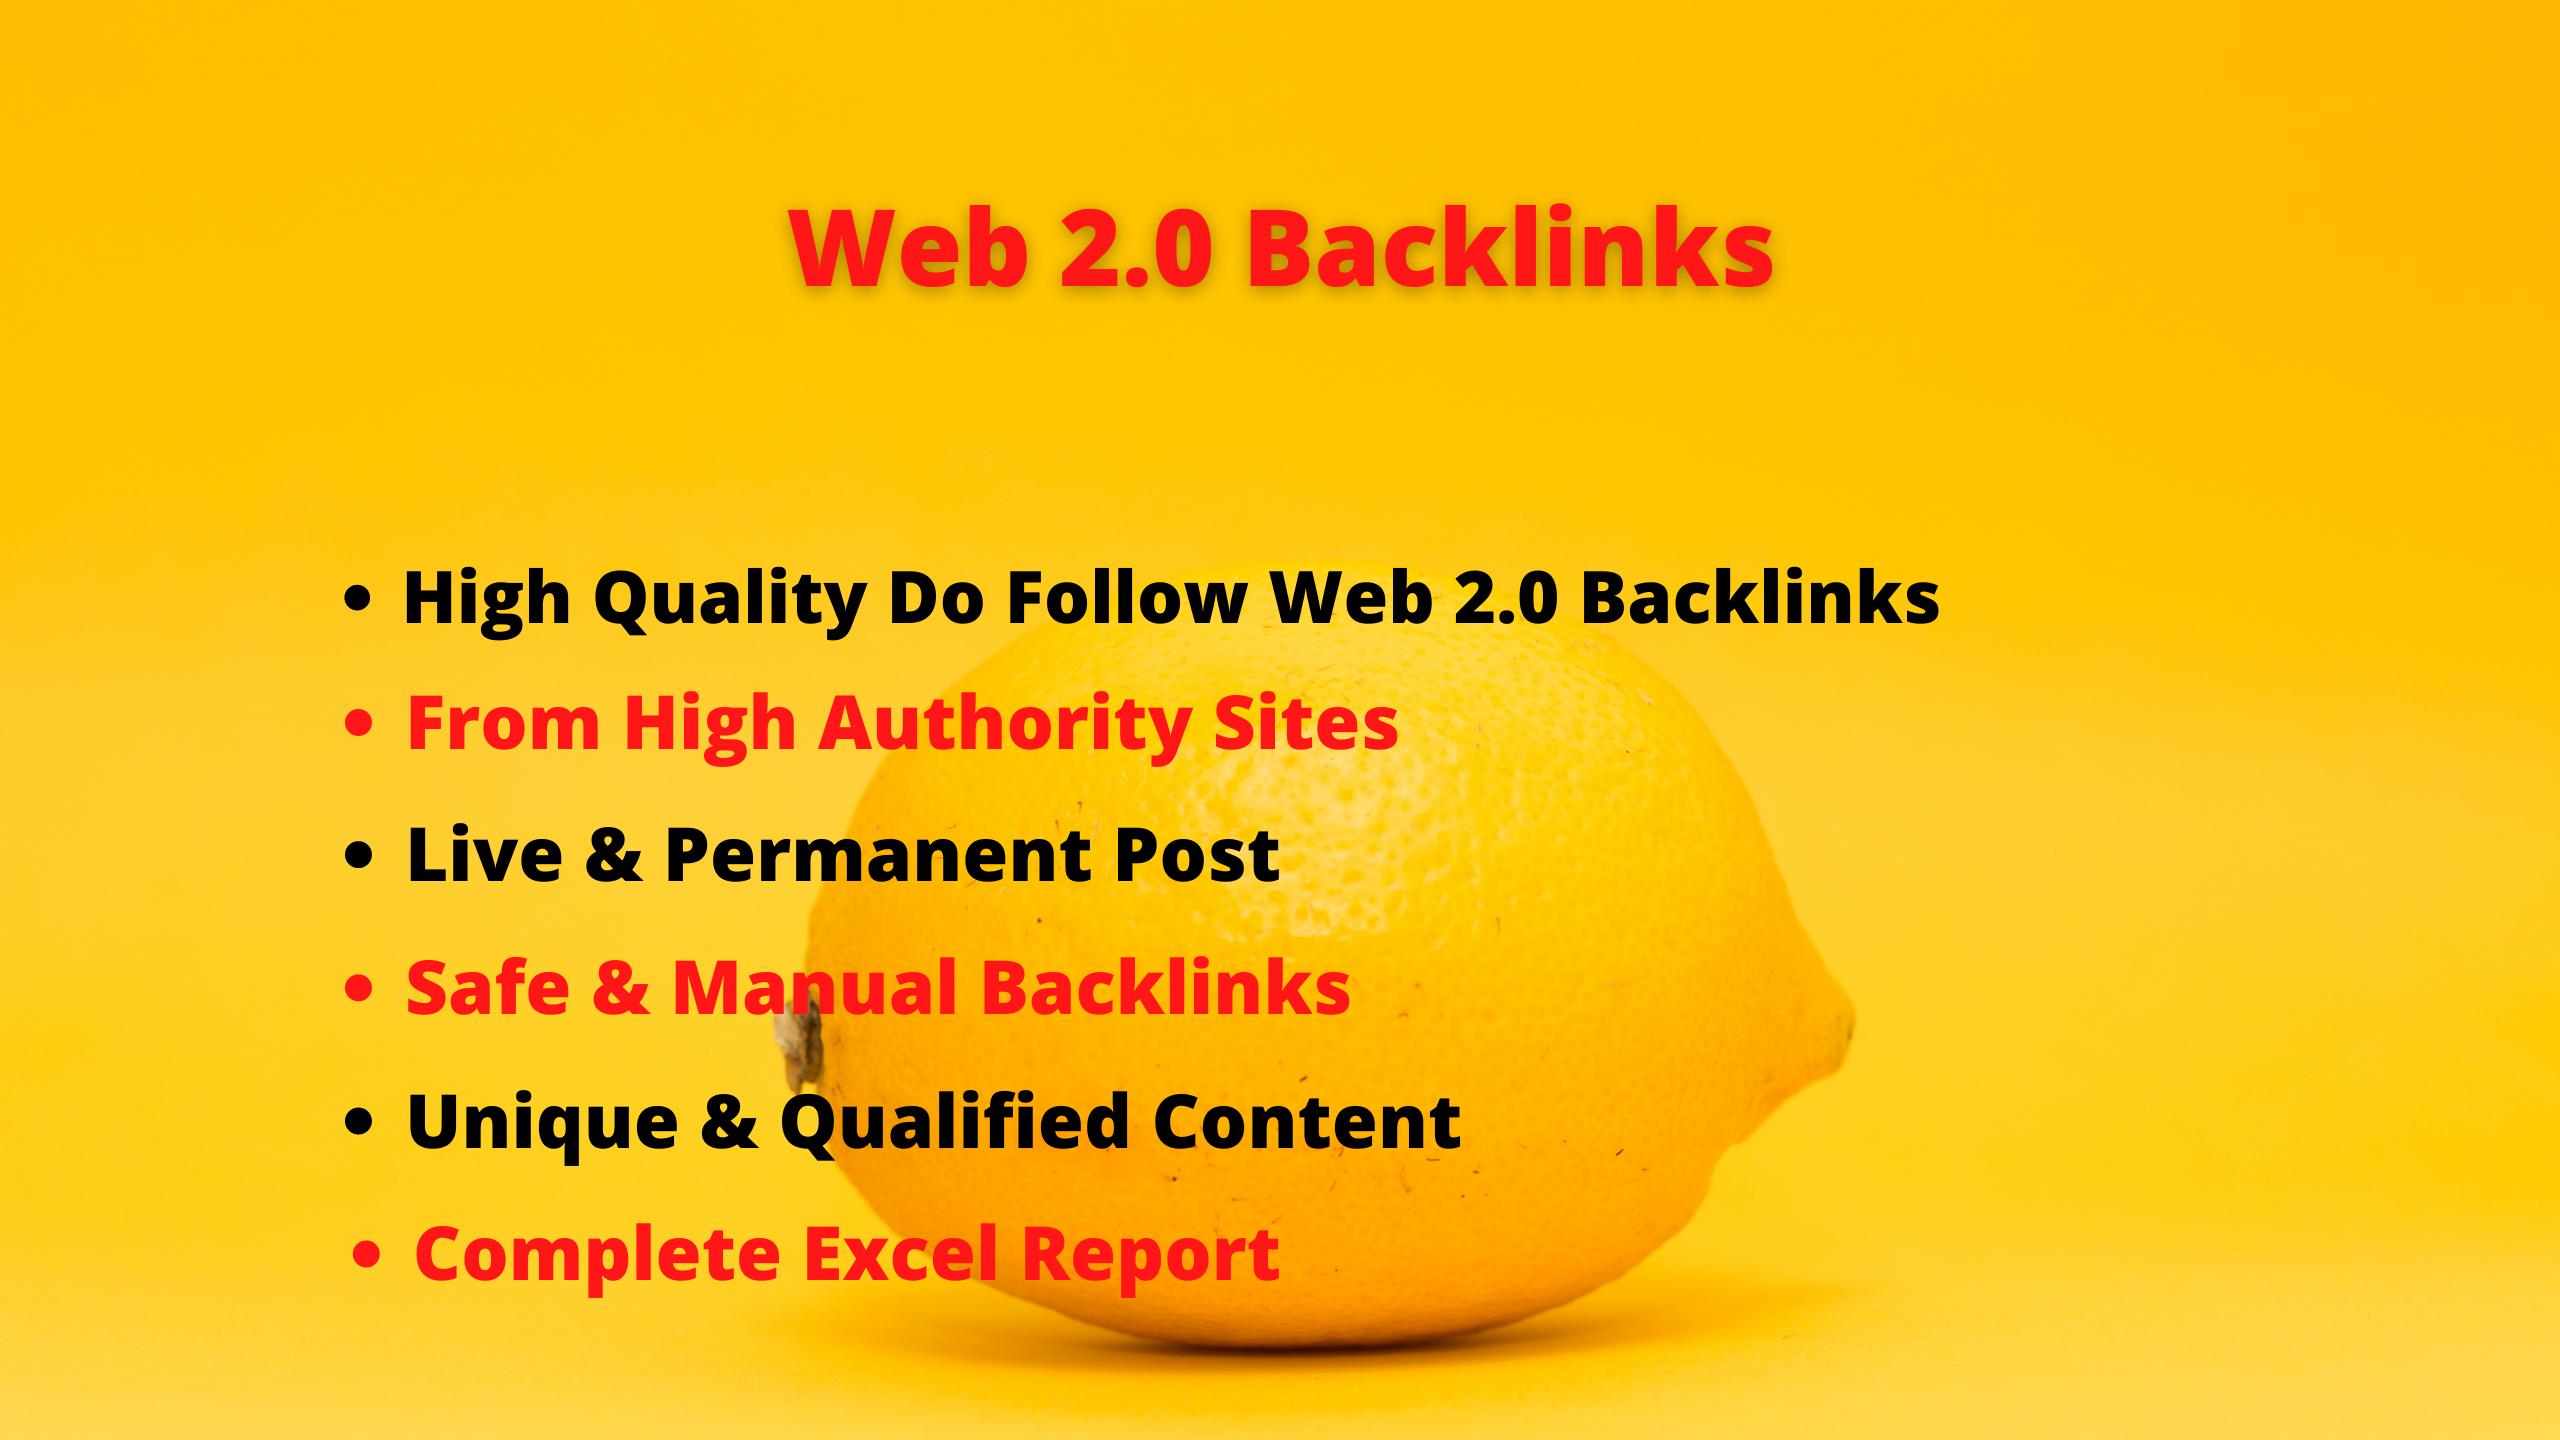 Get 70 High Quality Web 2.0 Profile Backlinks